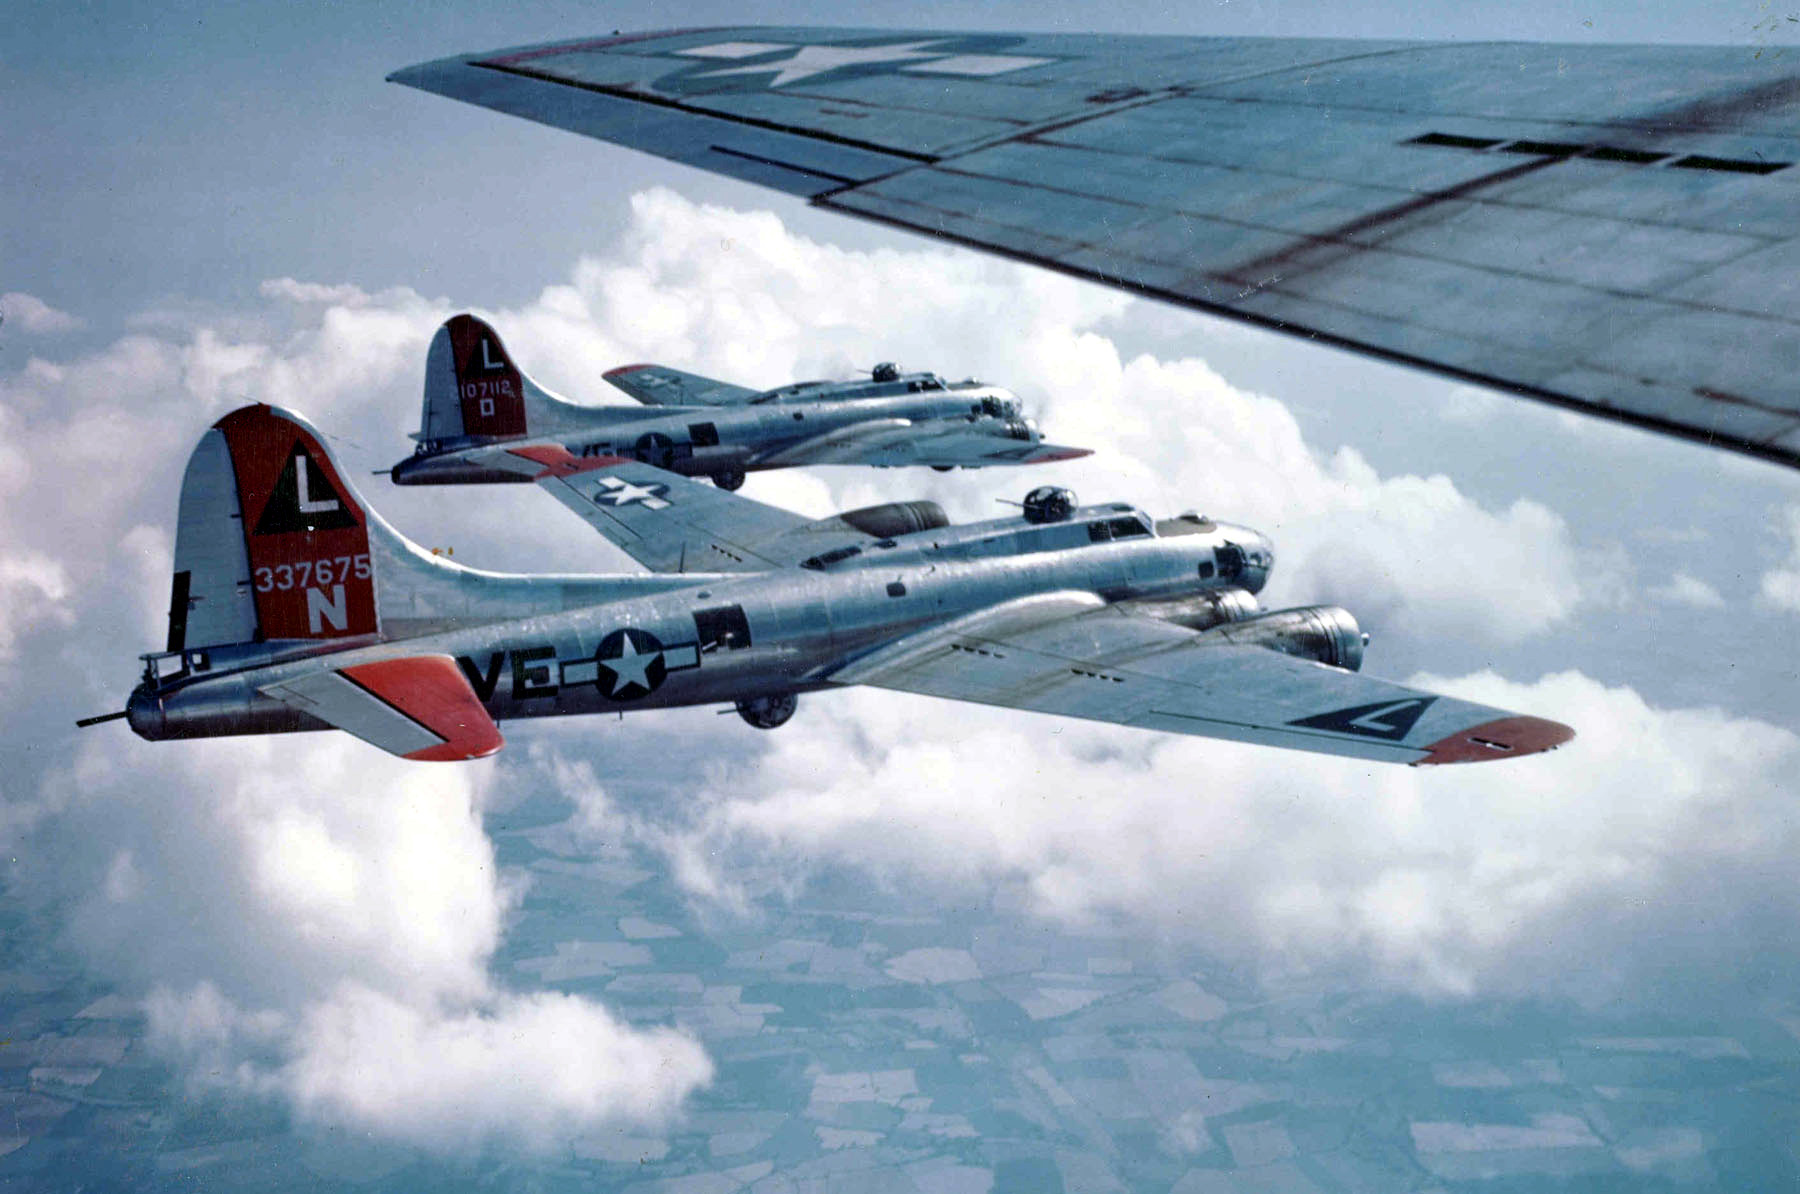 Boeing_B-17Gs_381BG_1944-45.jpg